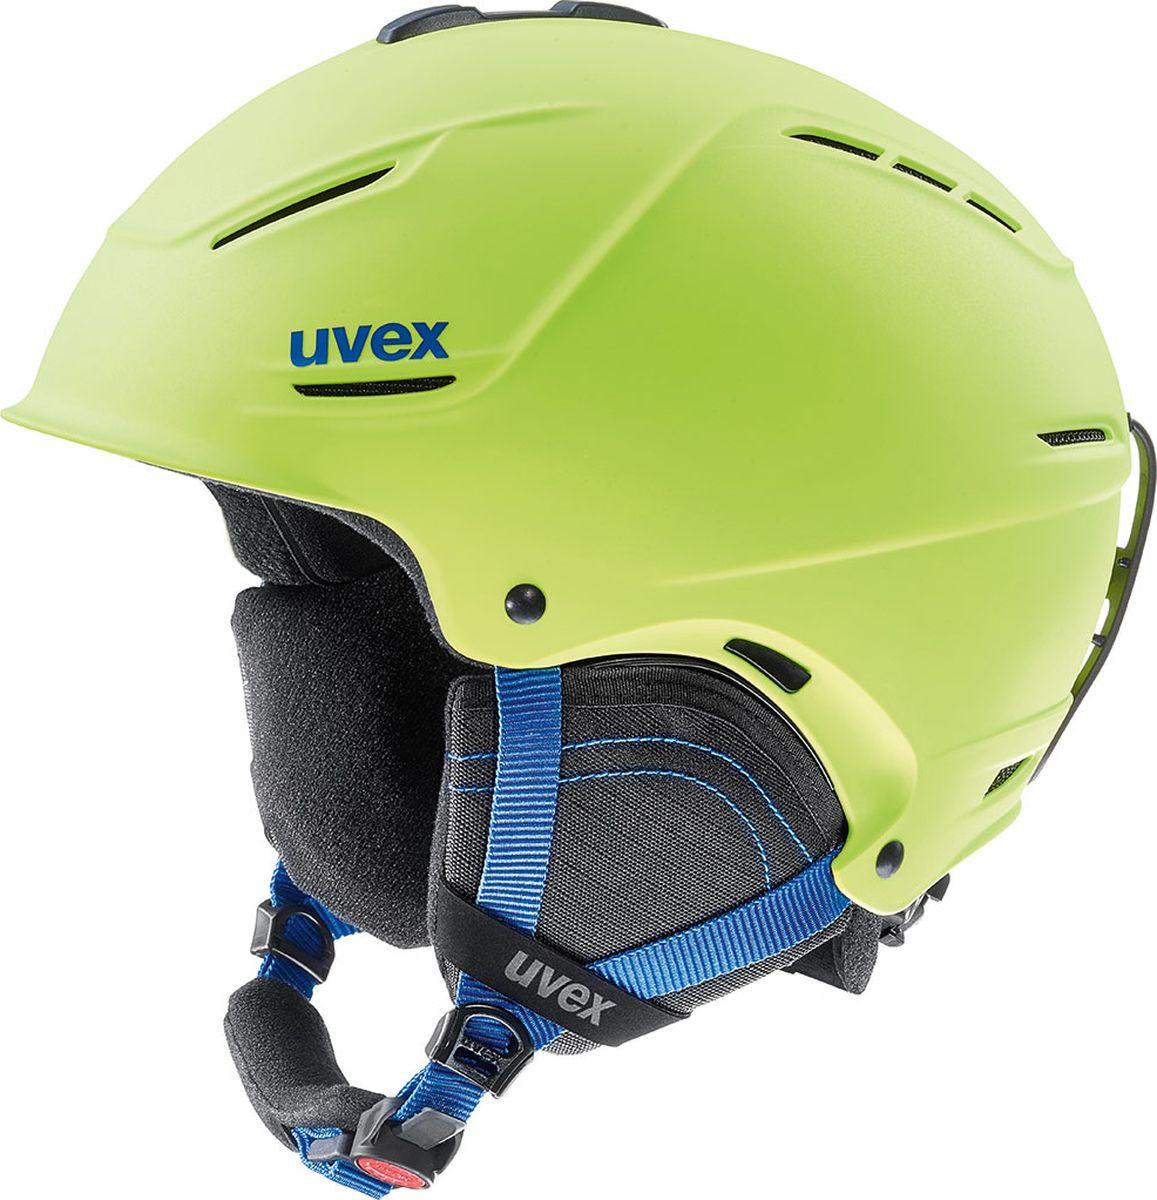 Шлем горнолыжный Uvex P1us 2.0 Helmet, цвет: лайм матовый. Размер 59/62